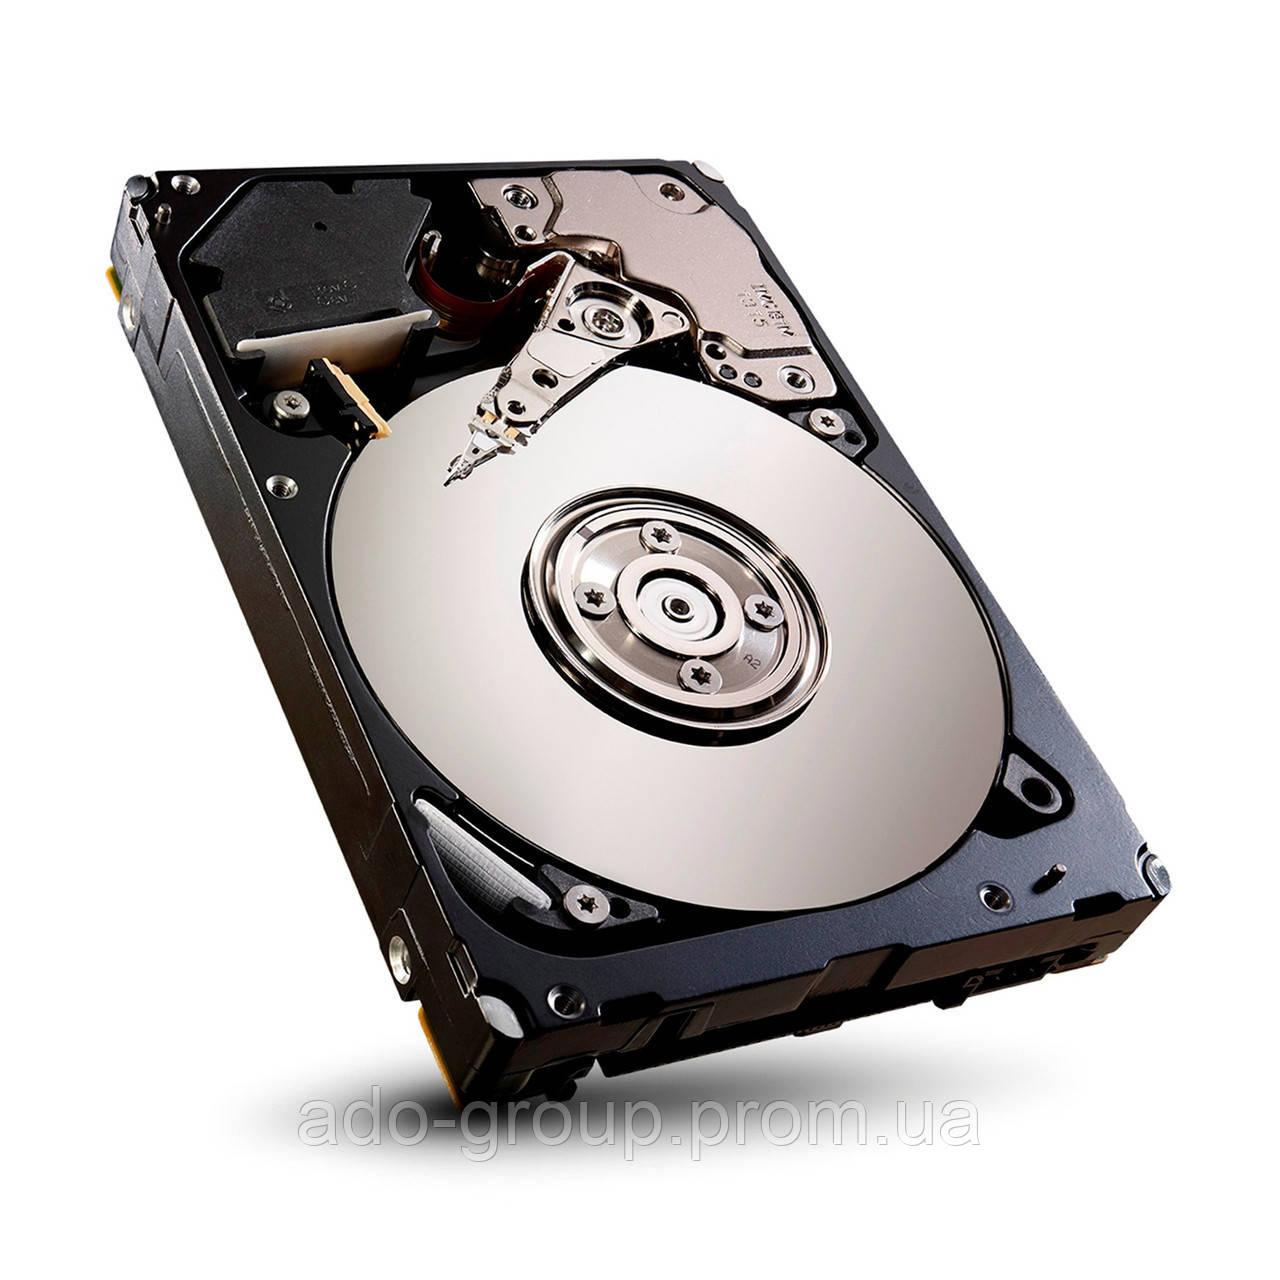 "0FR83F Жесткий диск Dell 900GB SAS 10K  2.5"" +"